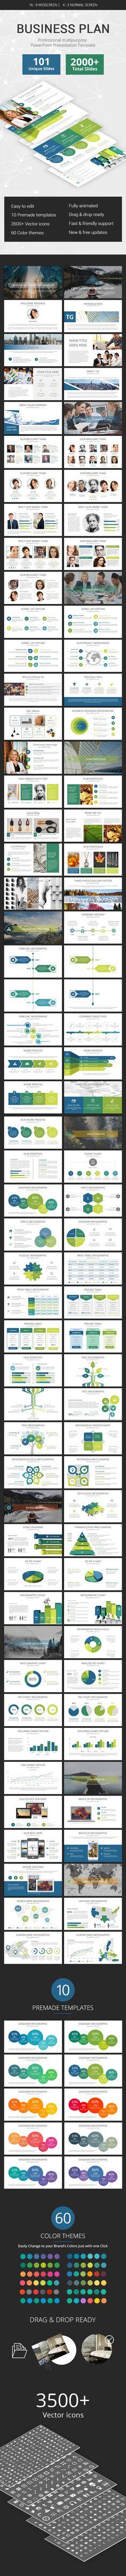 Business Plan PowerPoint Presentation Template - Business PowerPoint Templateshttps Download here: https://graphicriver.net/item/business-plan-powerpoint-presentation-template/18725689?ref=classicdesignp